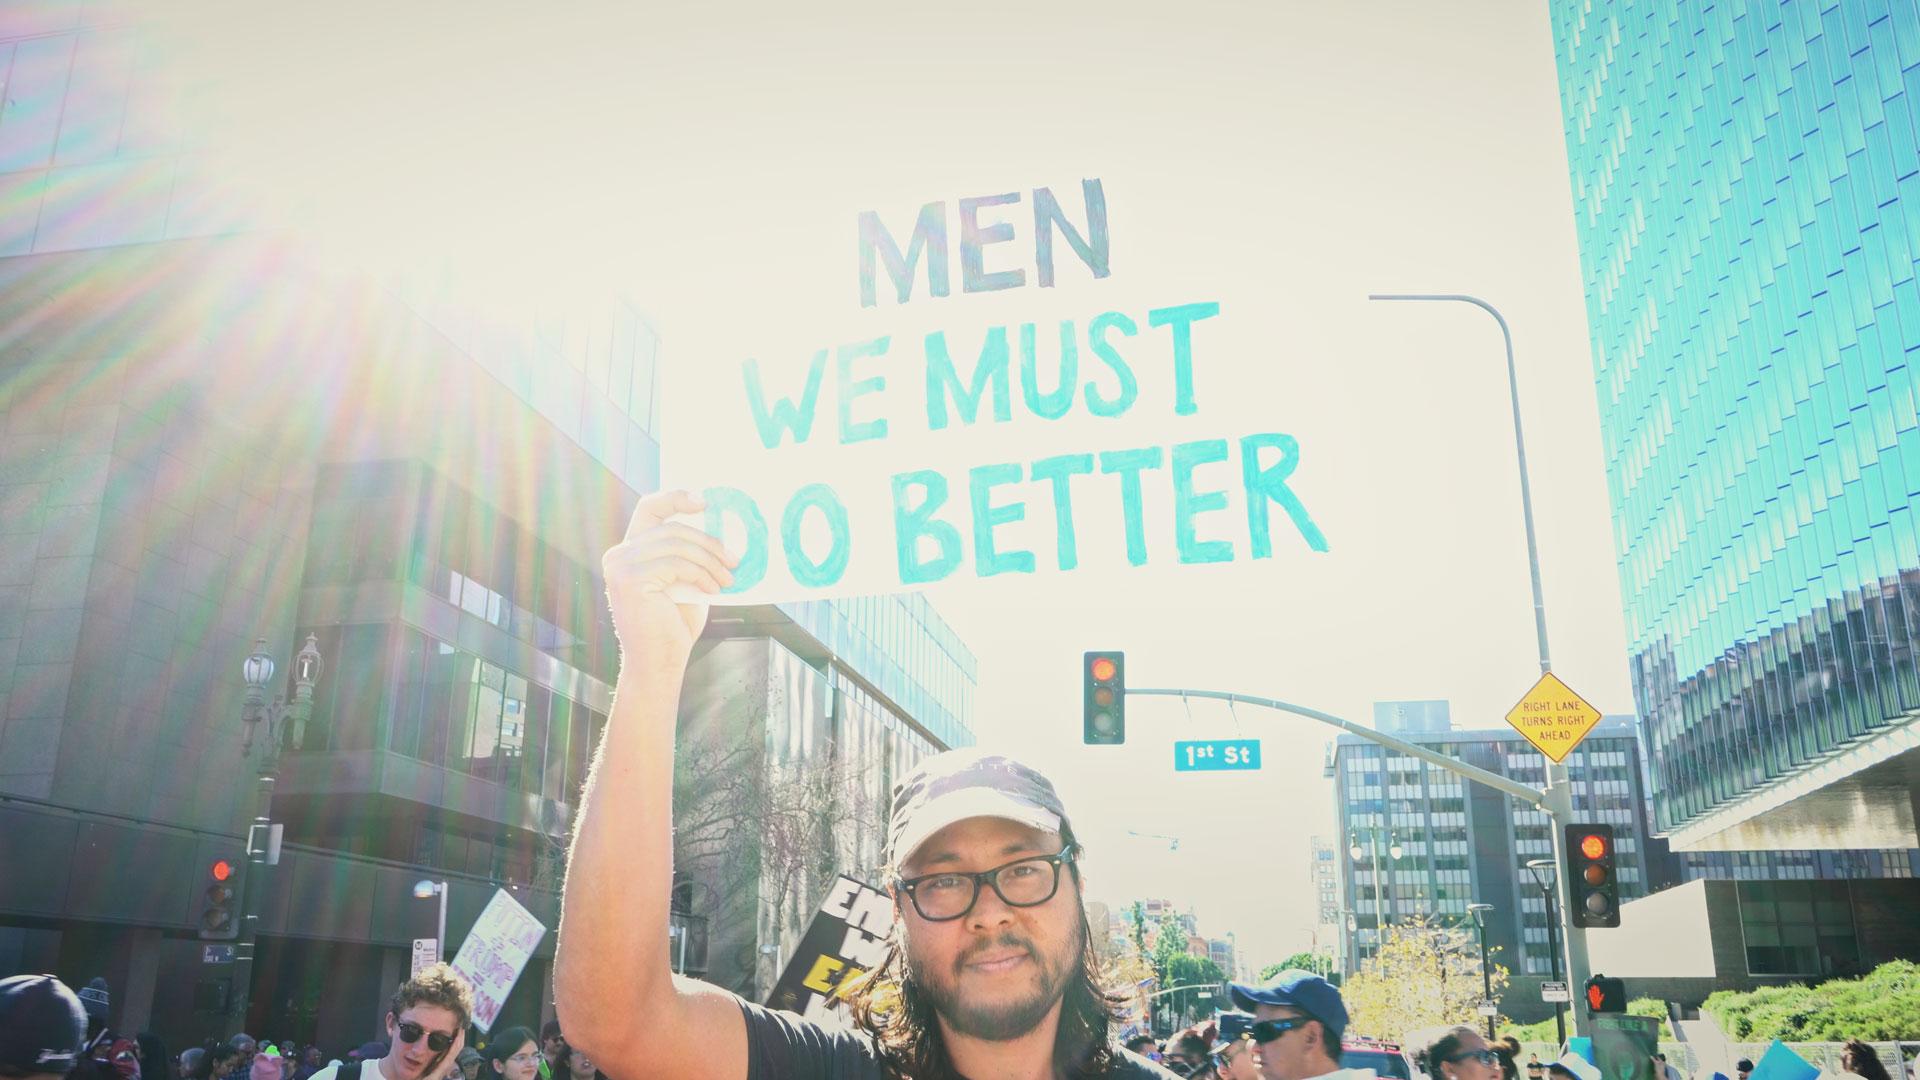 Nevertheless-Men-We-Must-Do-Better-Poster-1920x1080